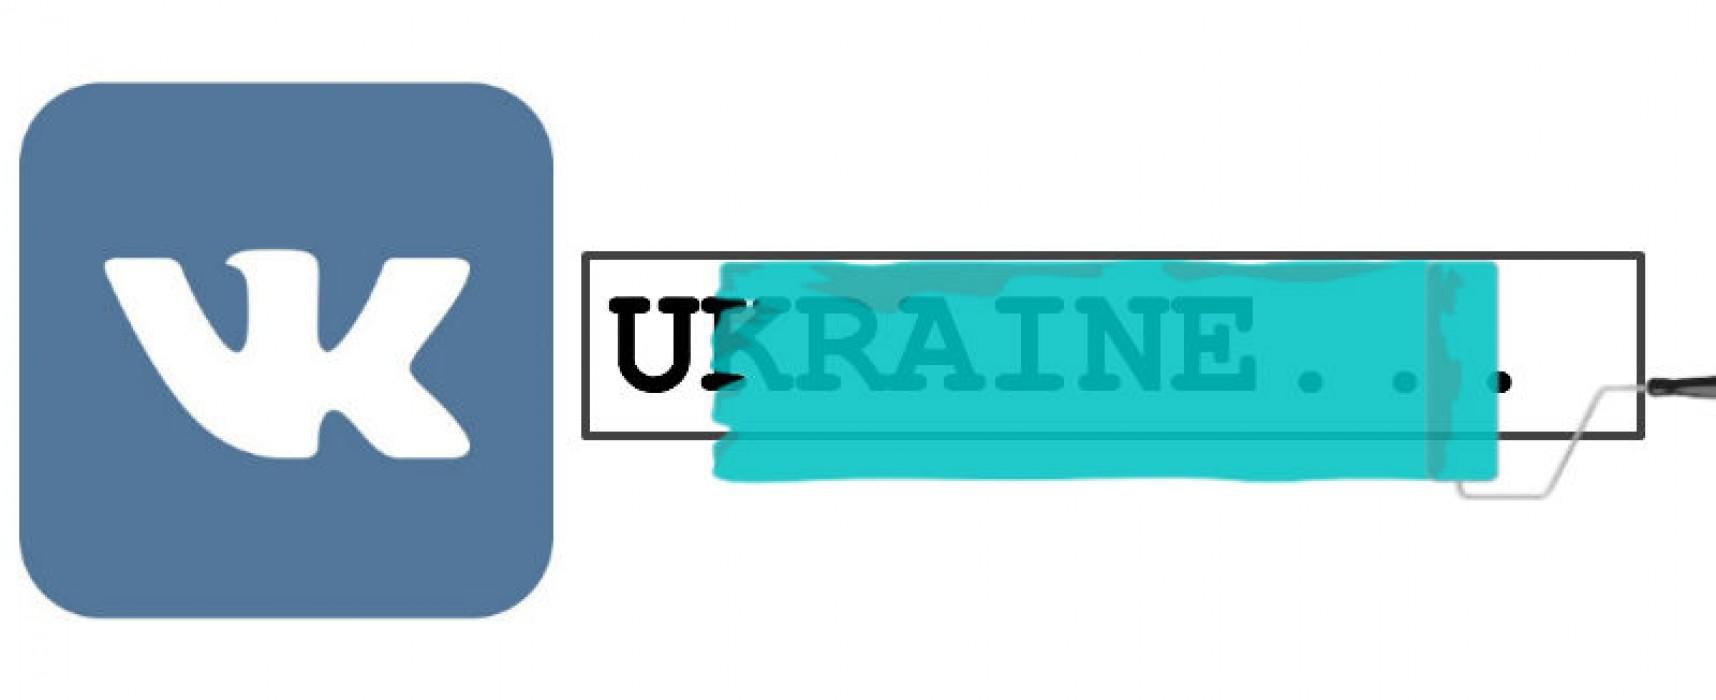 Russia Investigates VKontakte User for Posting Ukraine-Related Content